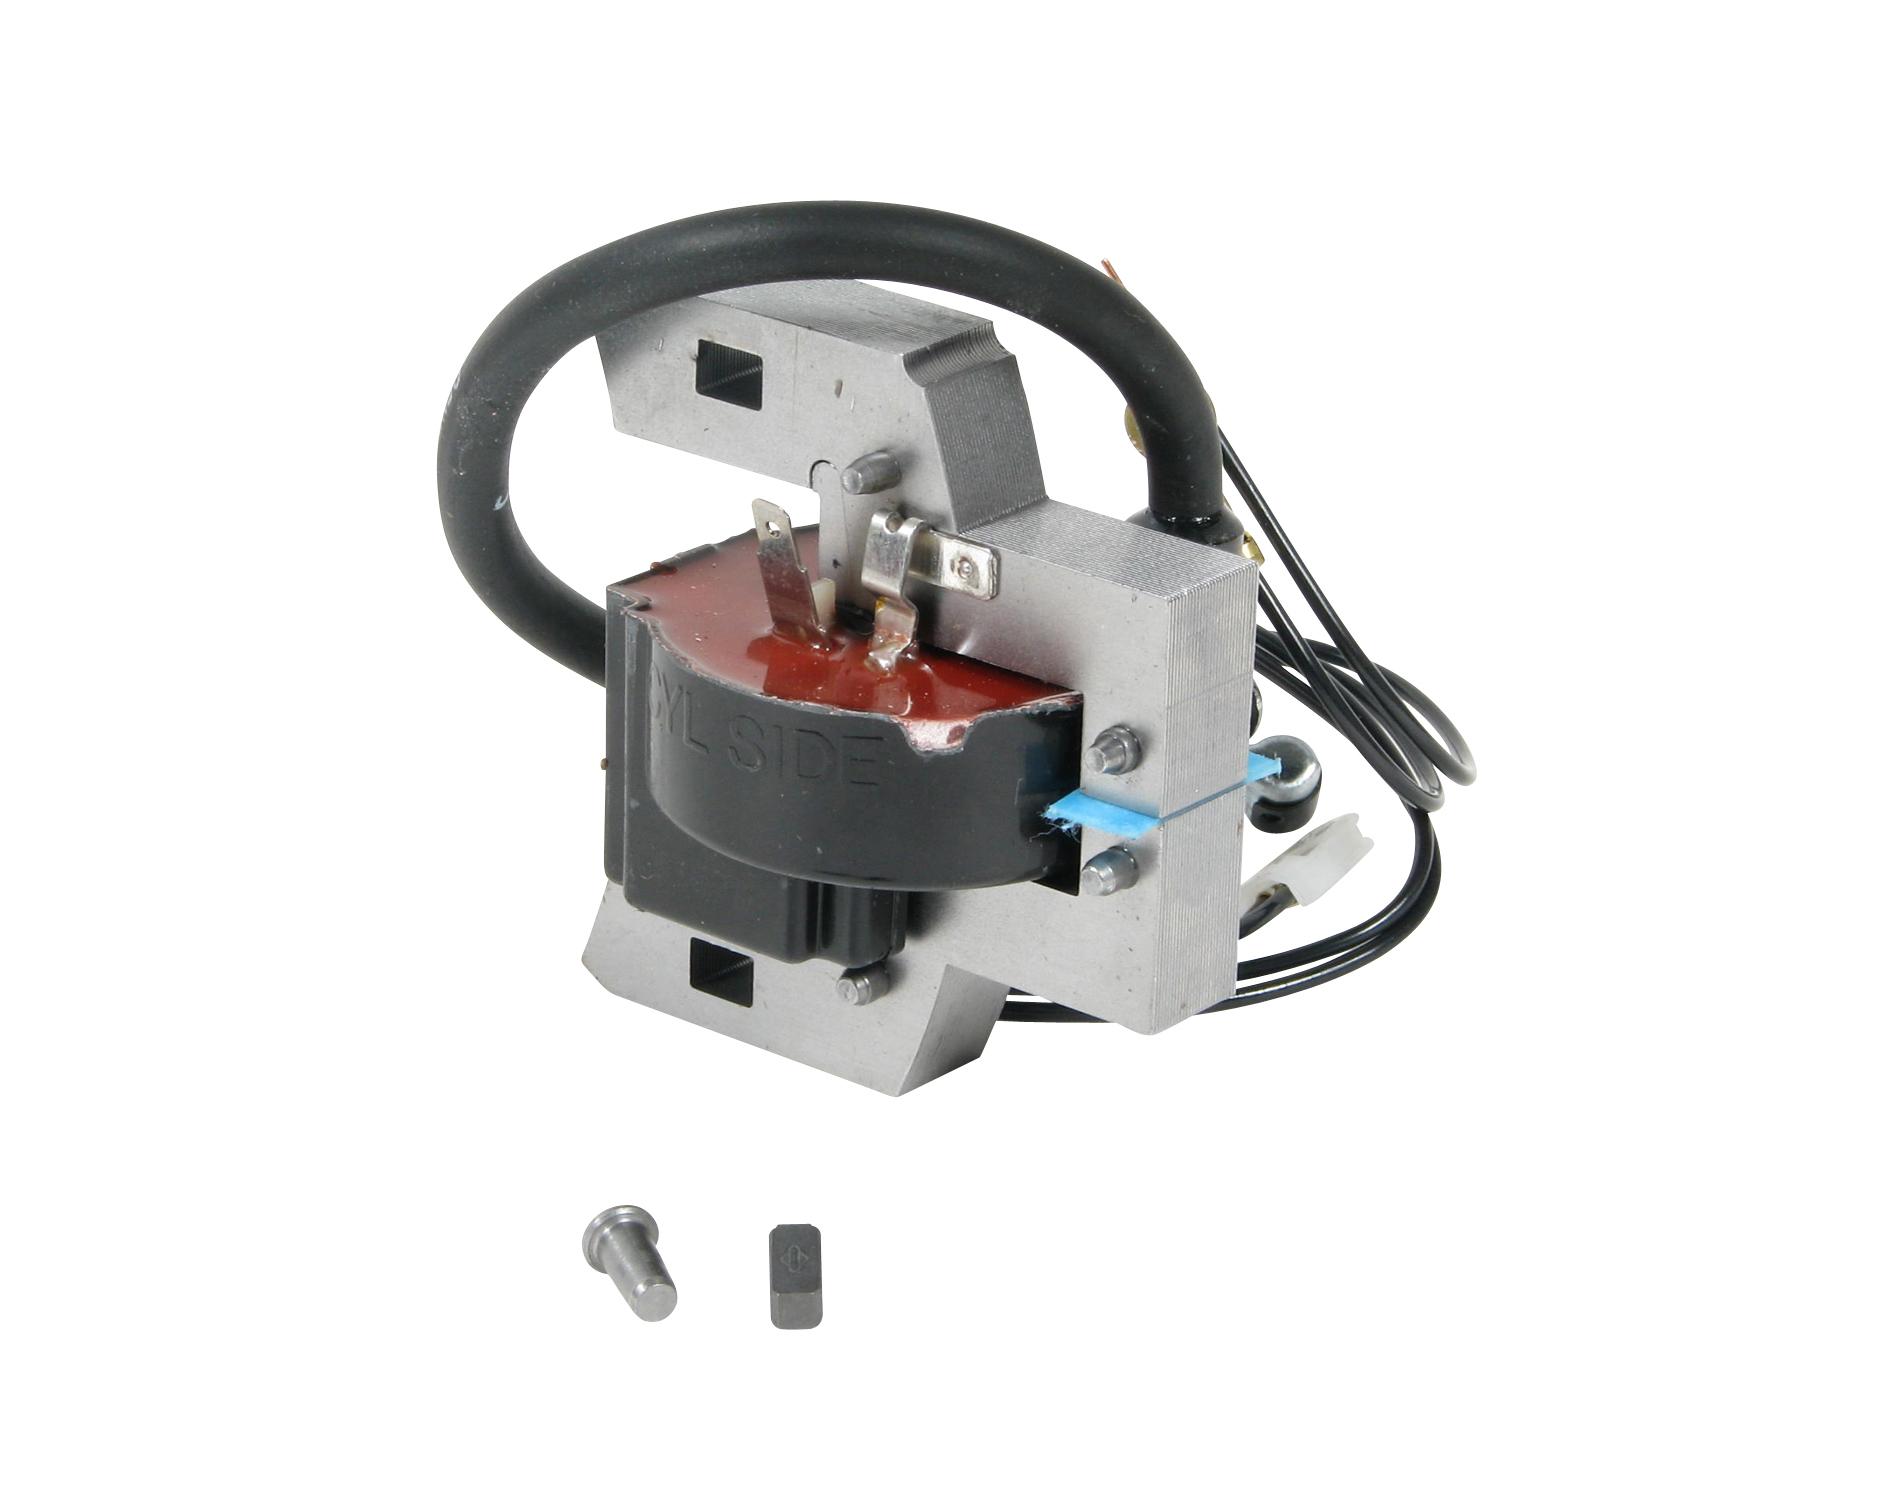 hight resolution of 397358 brigg wiring diagram